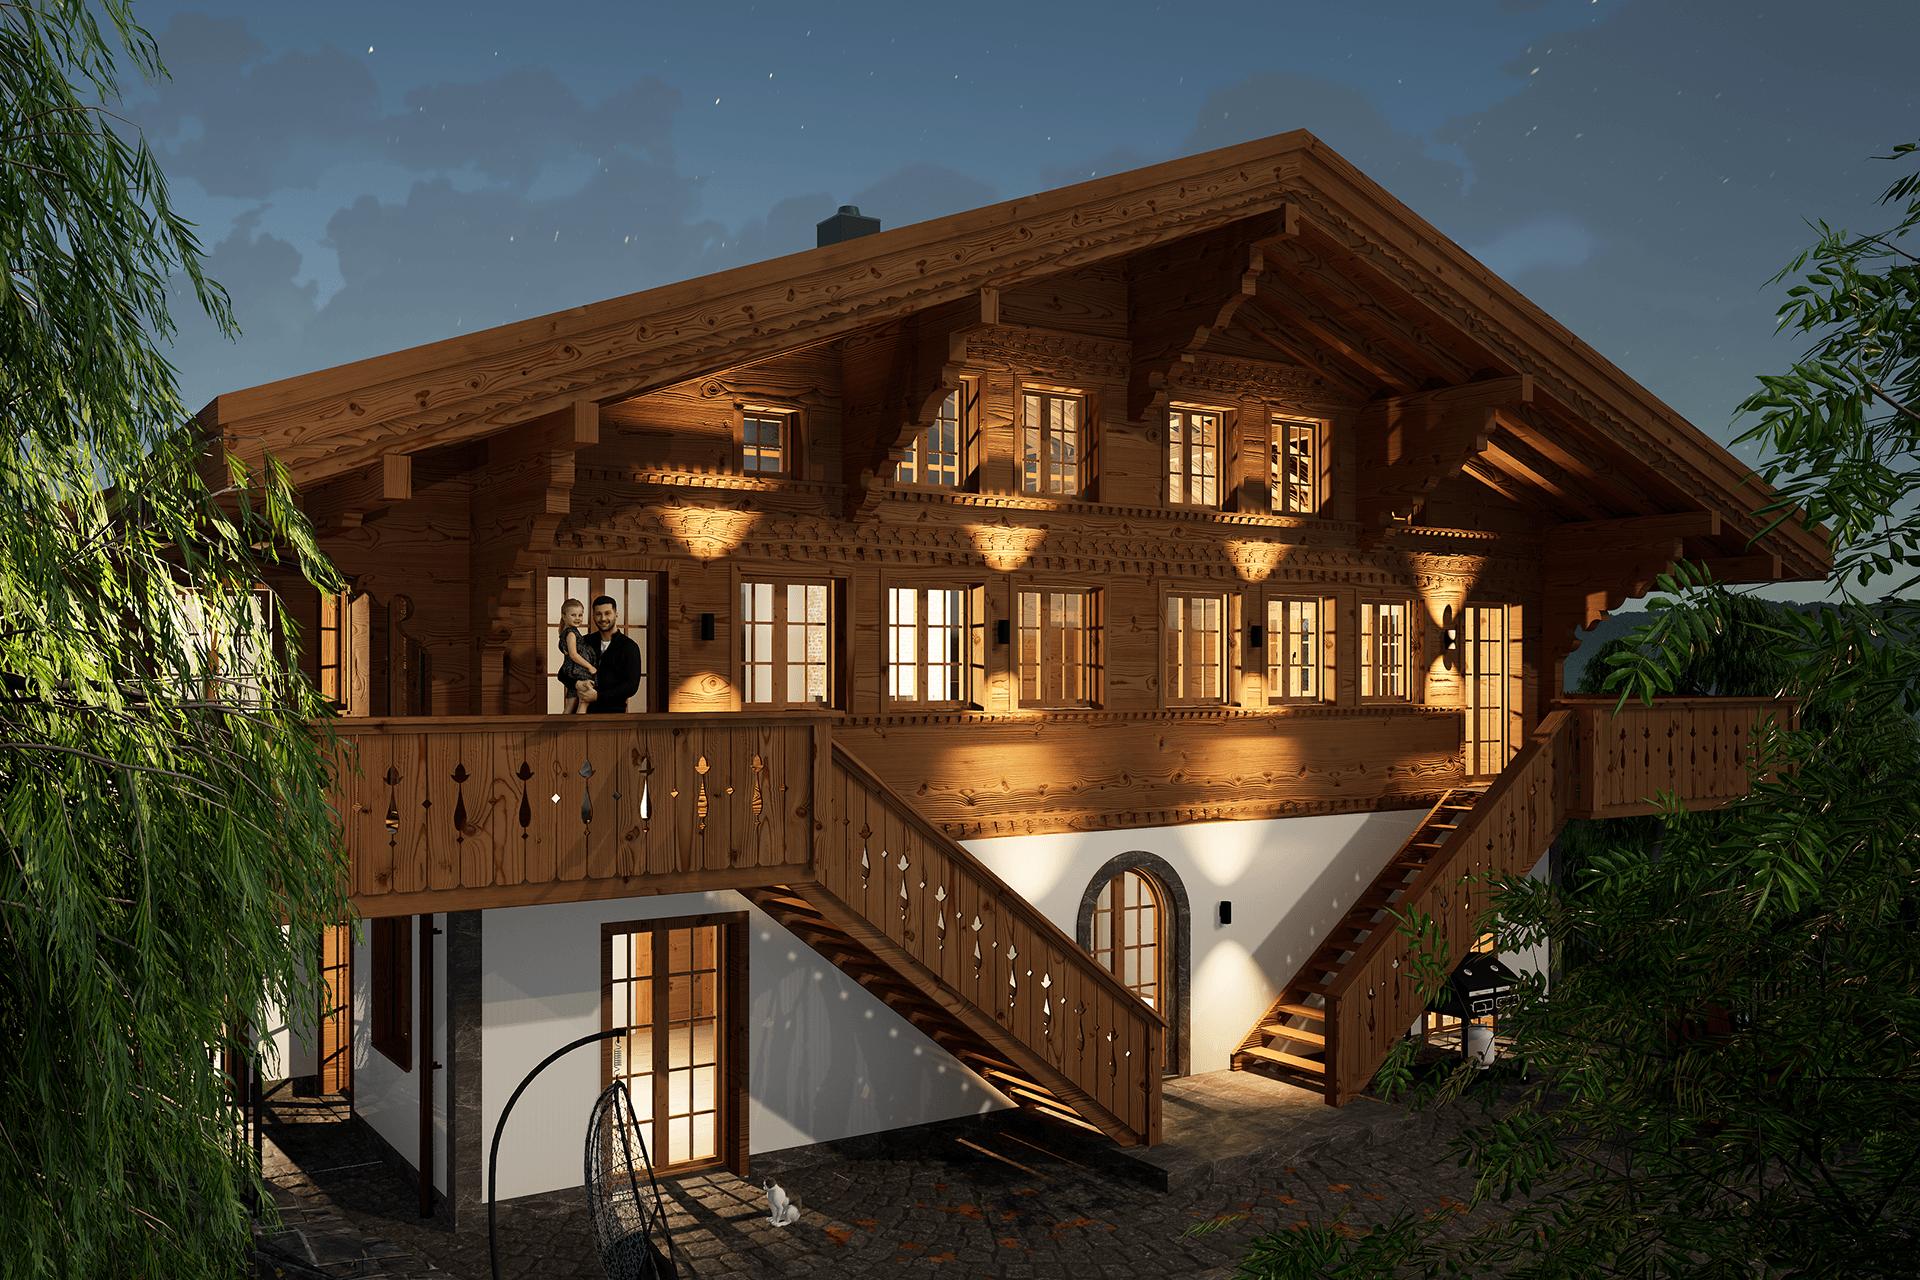 https://fsw-kreatektur.ch/wp-content/uploads/Fsw-Kreatektur-Architektur-Visualisierungen-Privat-Lenk-Fassade-Chalet.png